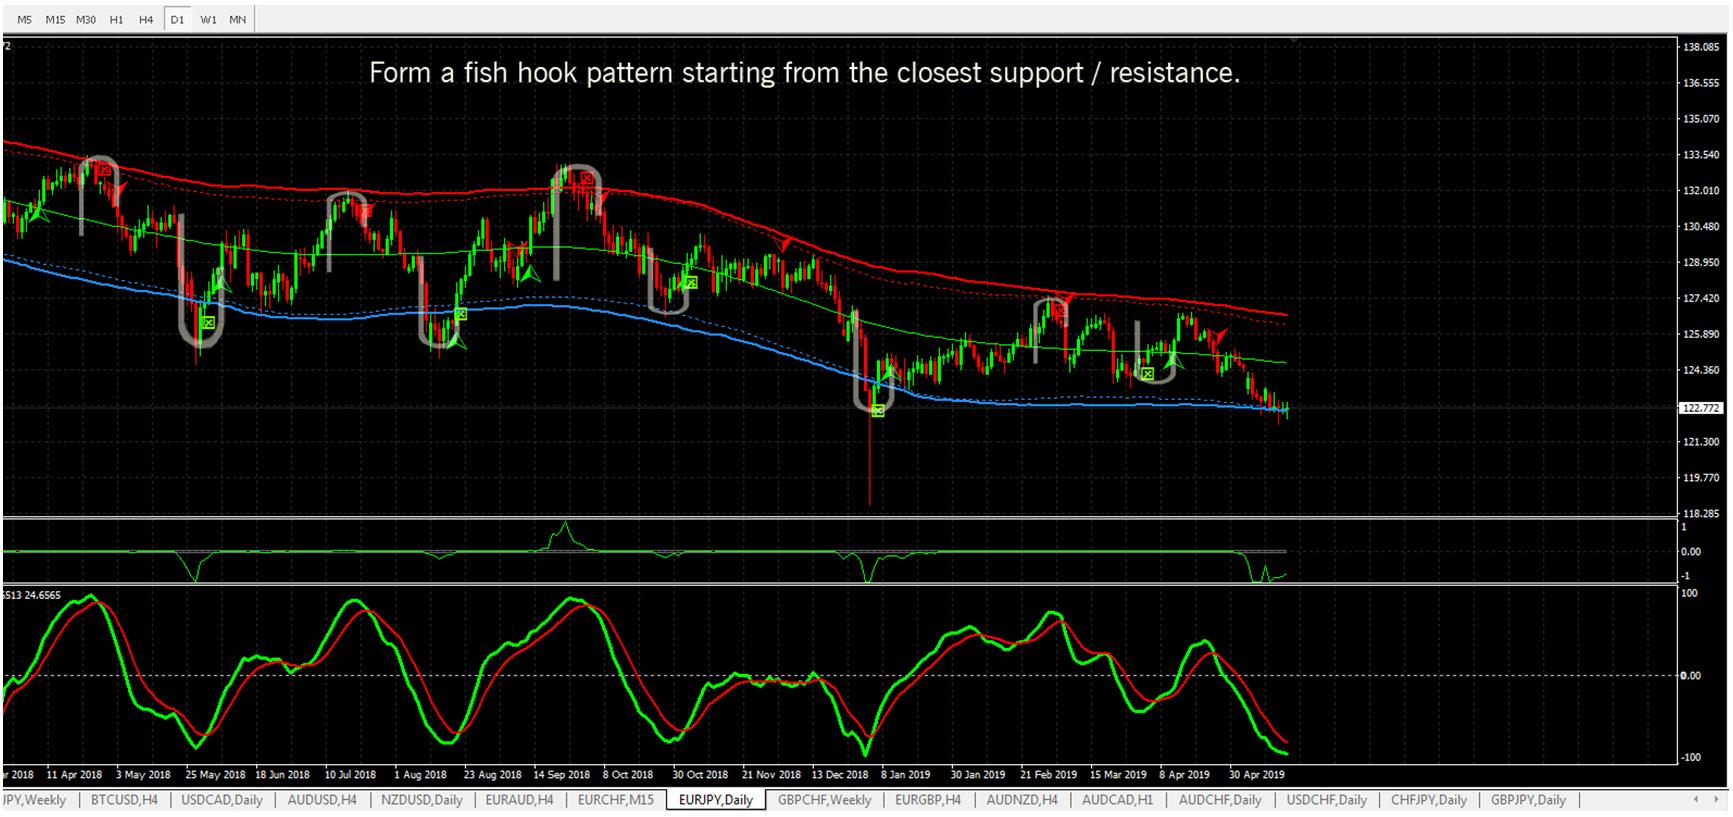 forex4live fish hook pattern